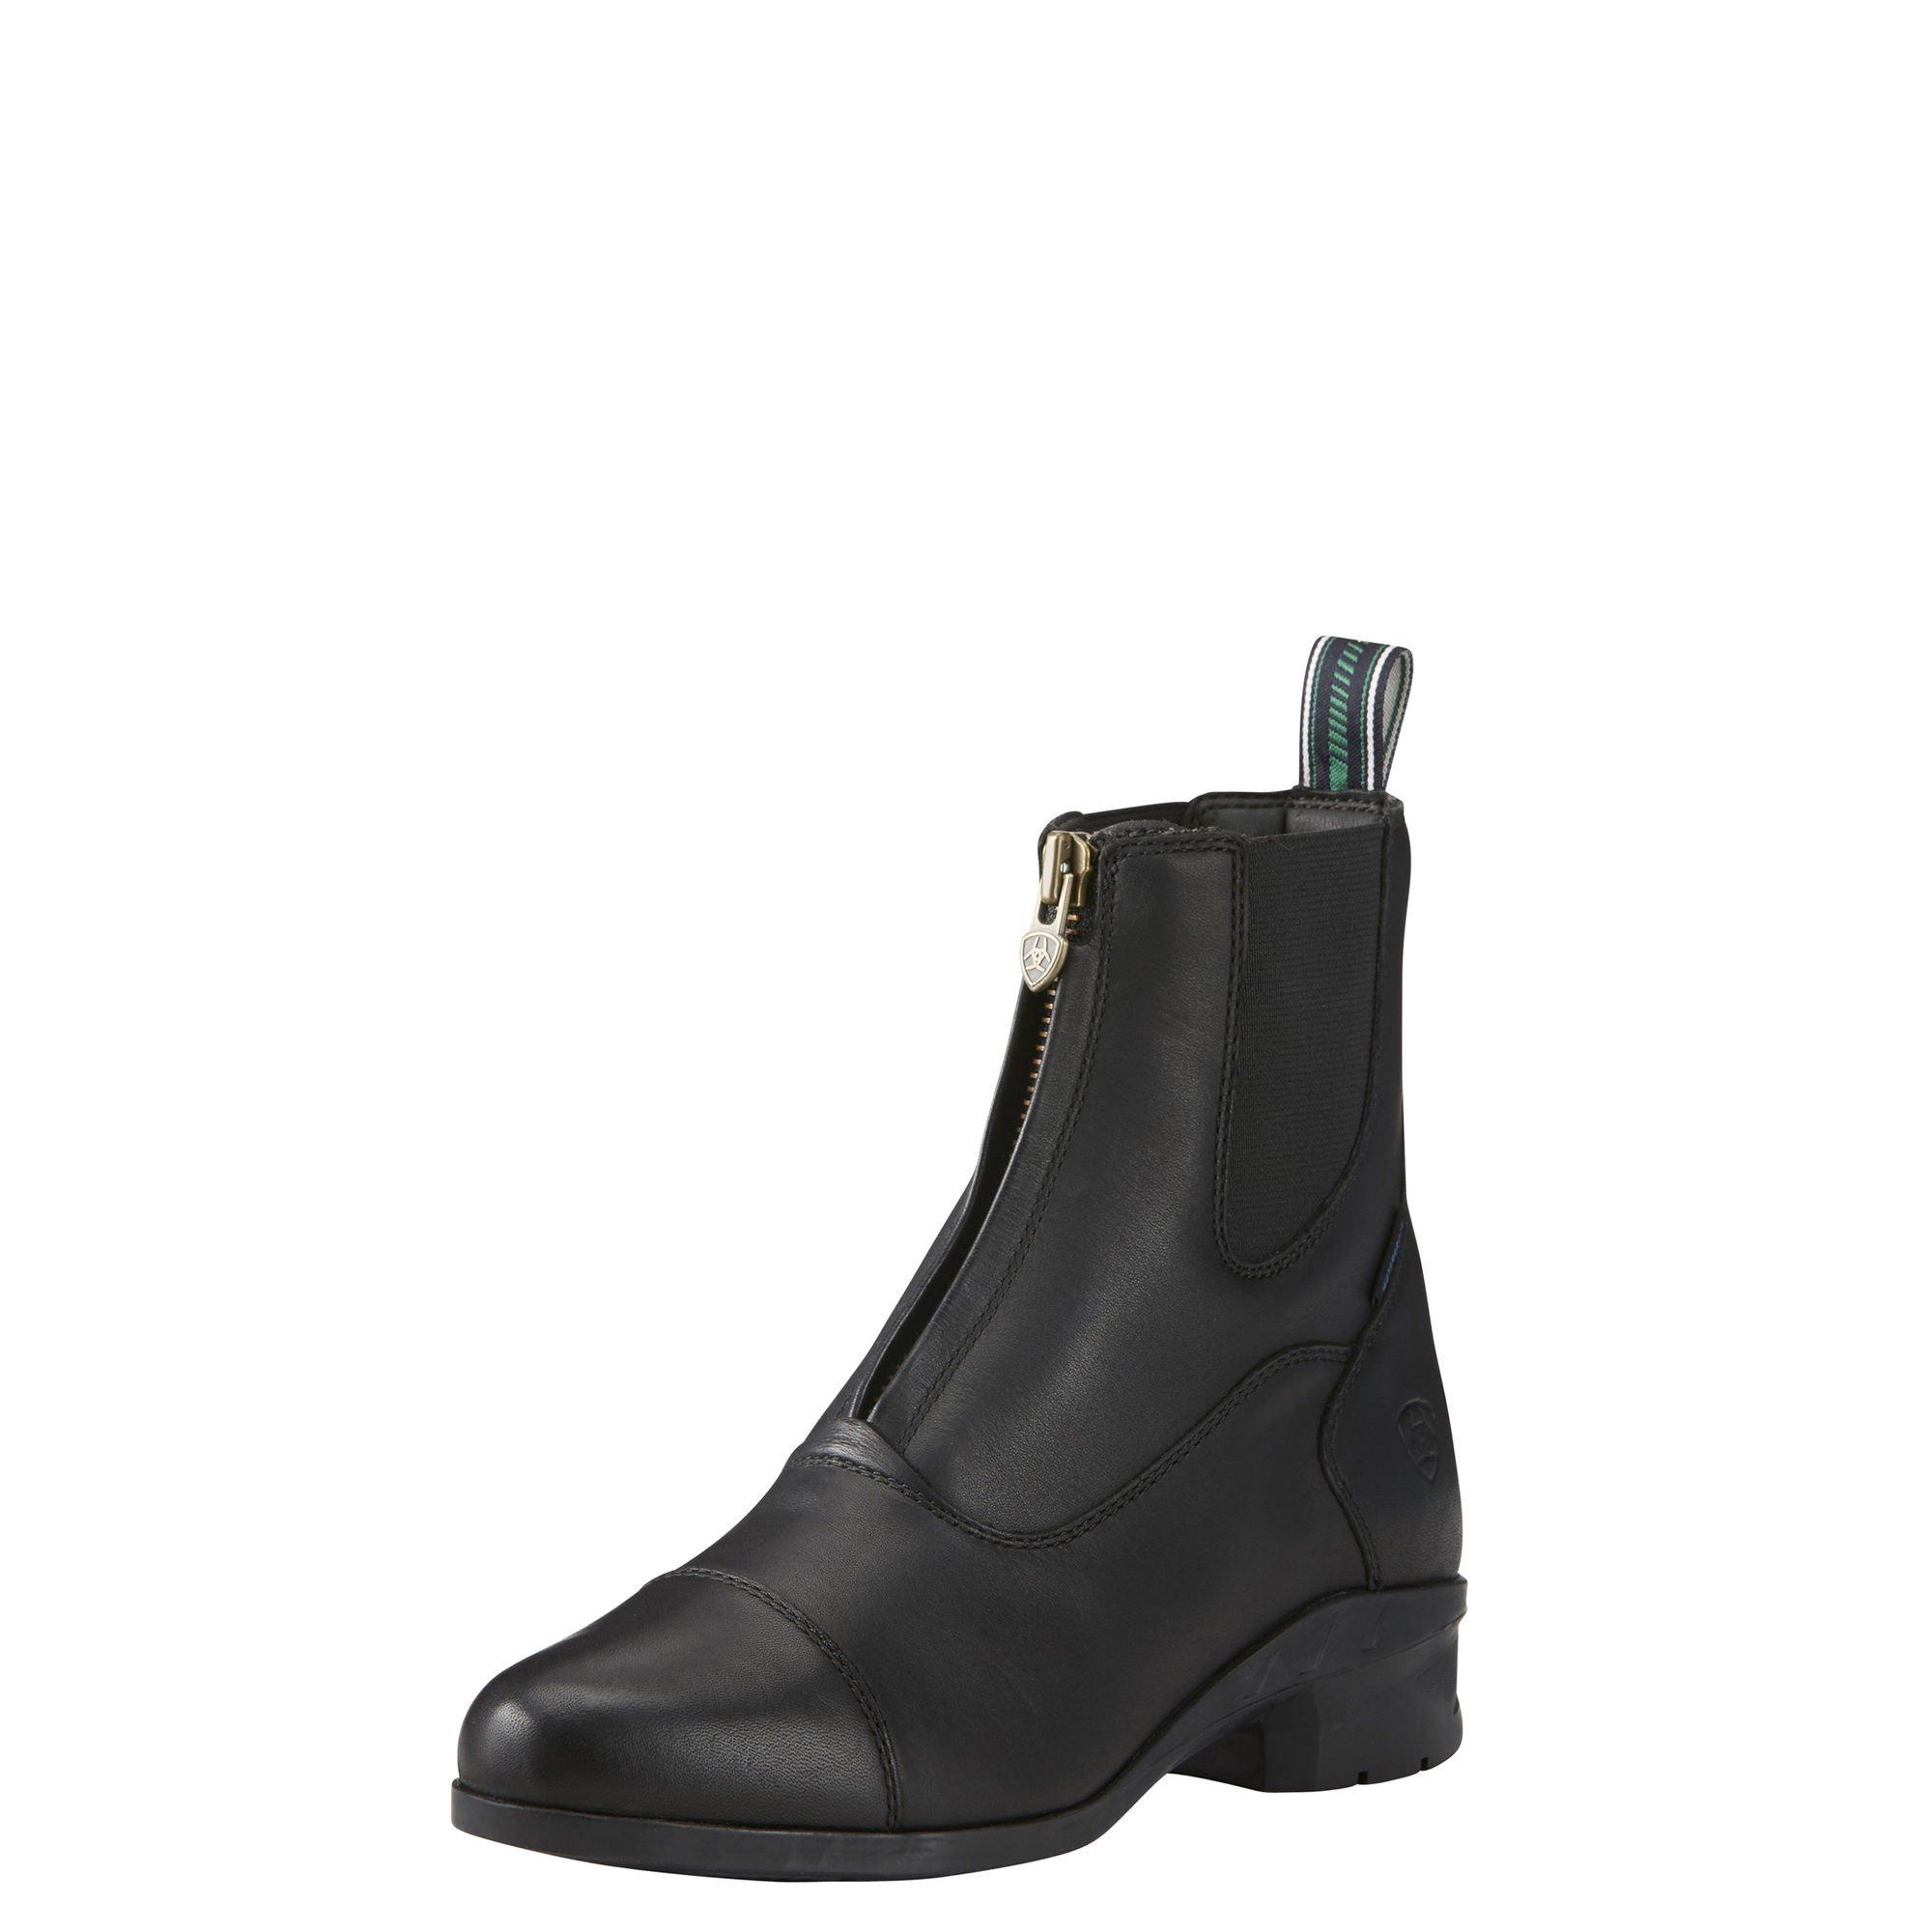 Ariat Women's Heritage IV Zip Paddock Boot, Black, 8 B US